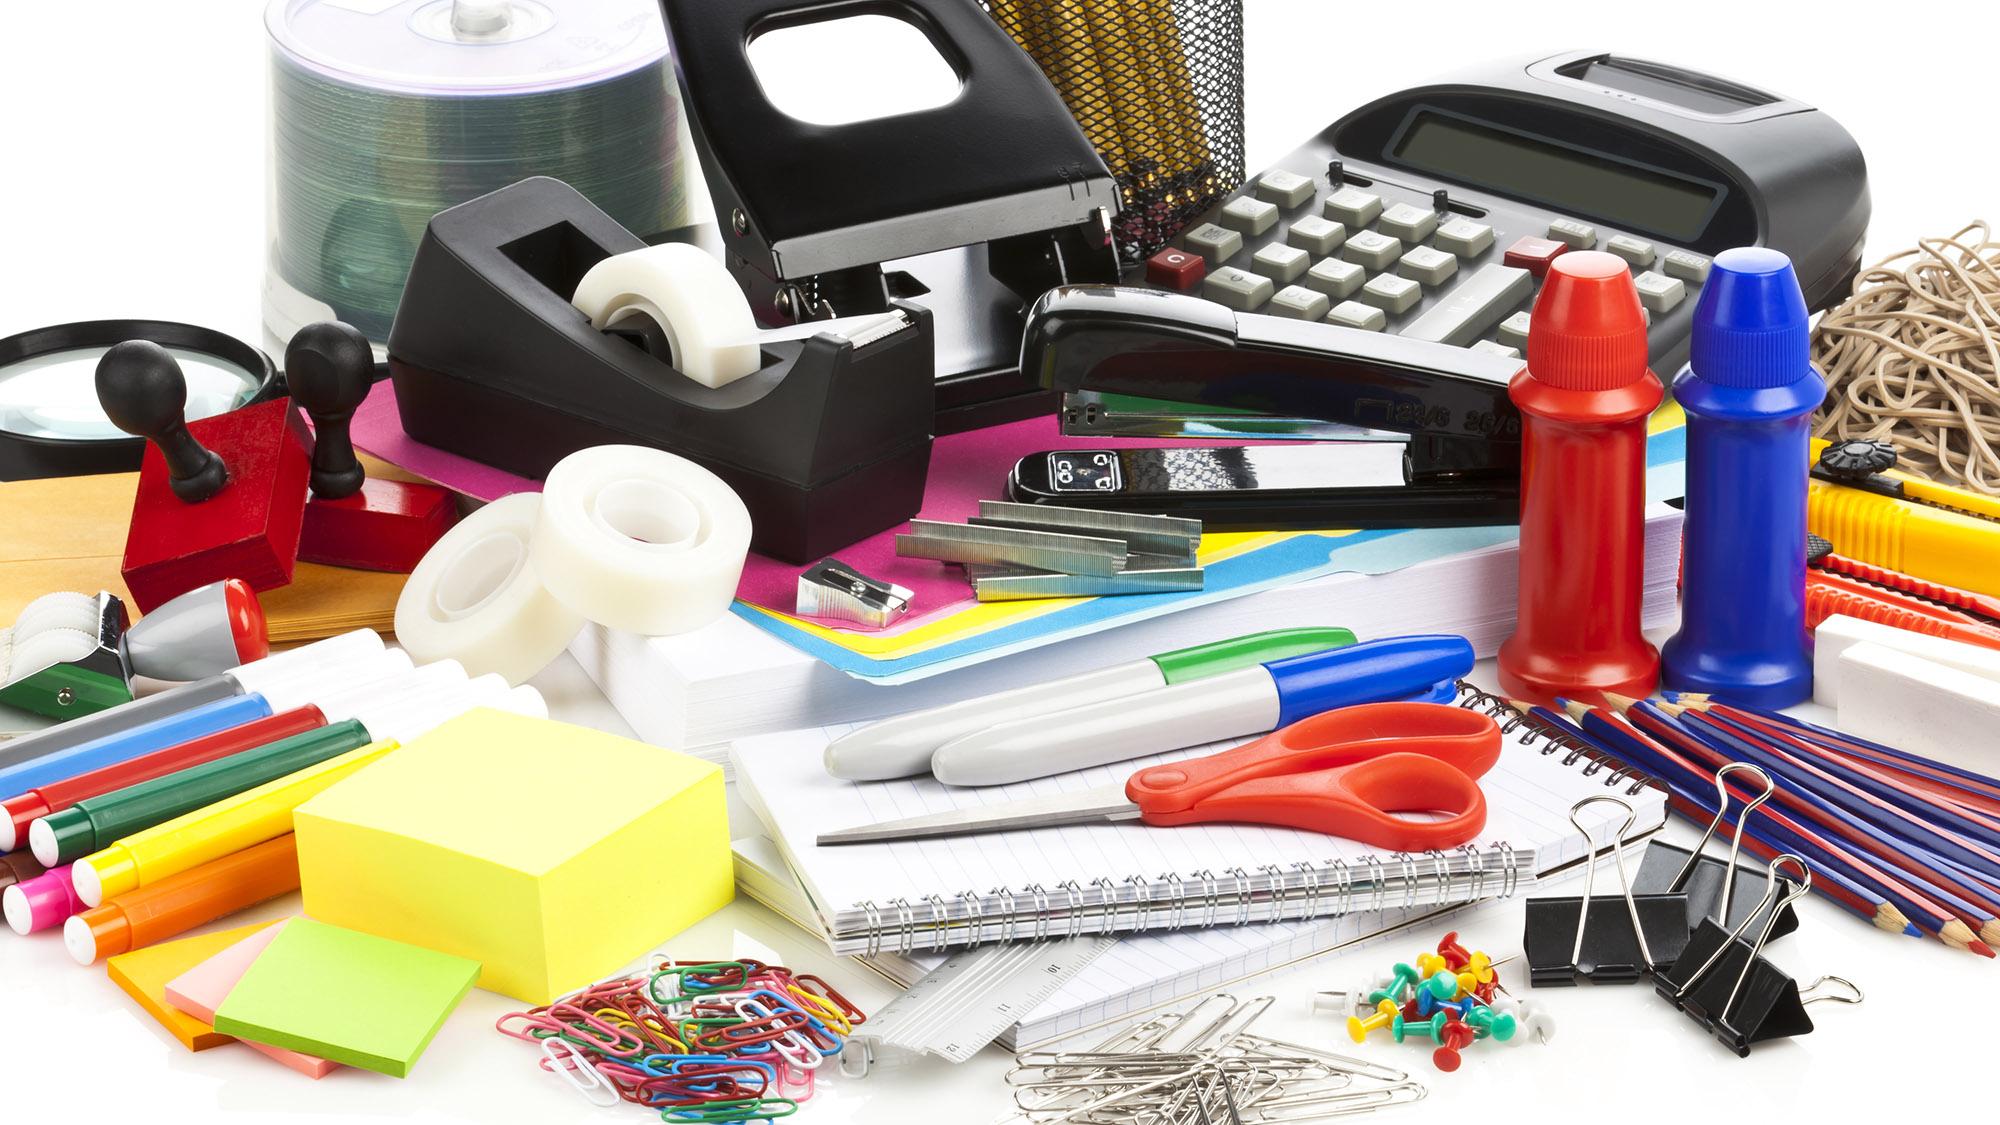 Office supplies 182060333 UK CW